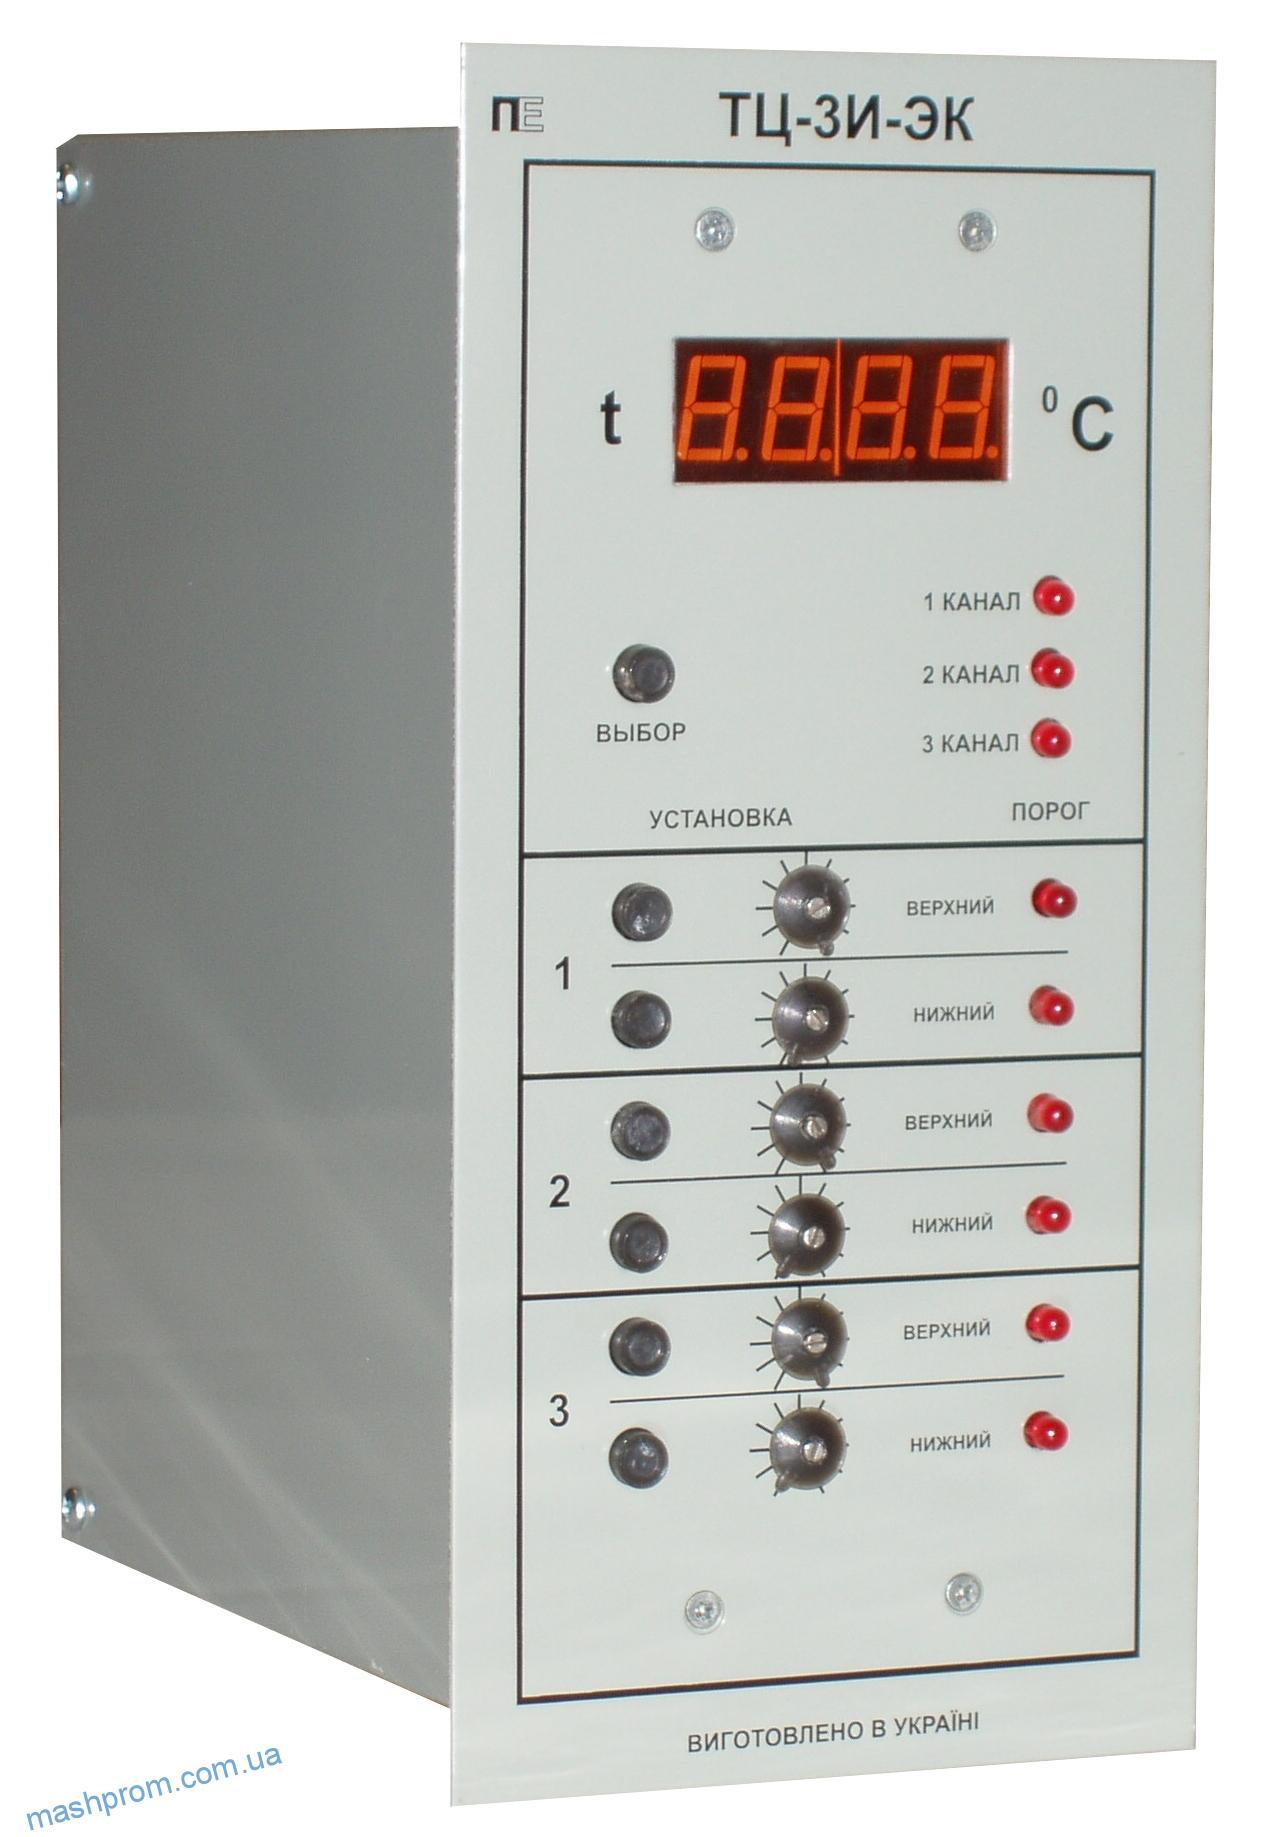 Регулятор температуры цифровой электроконтактный ТЦ-3И ЭК (Аналог КМ 140; ЭРА; ТУДЕ; ТГП; ТКП)